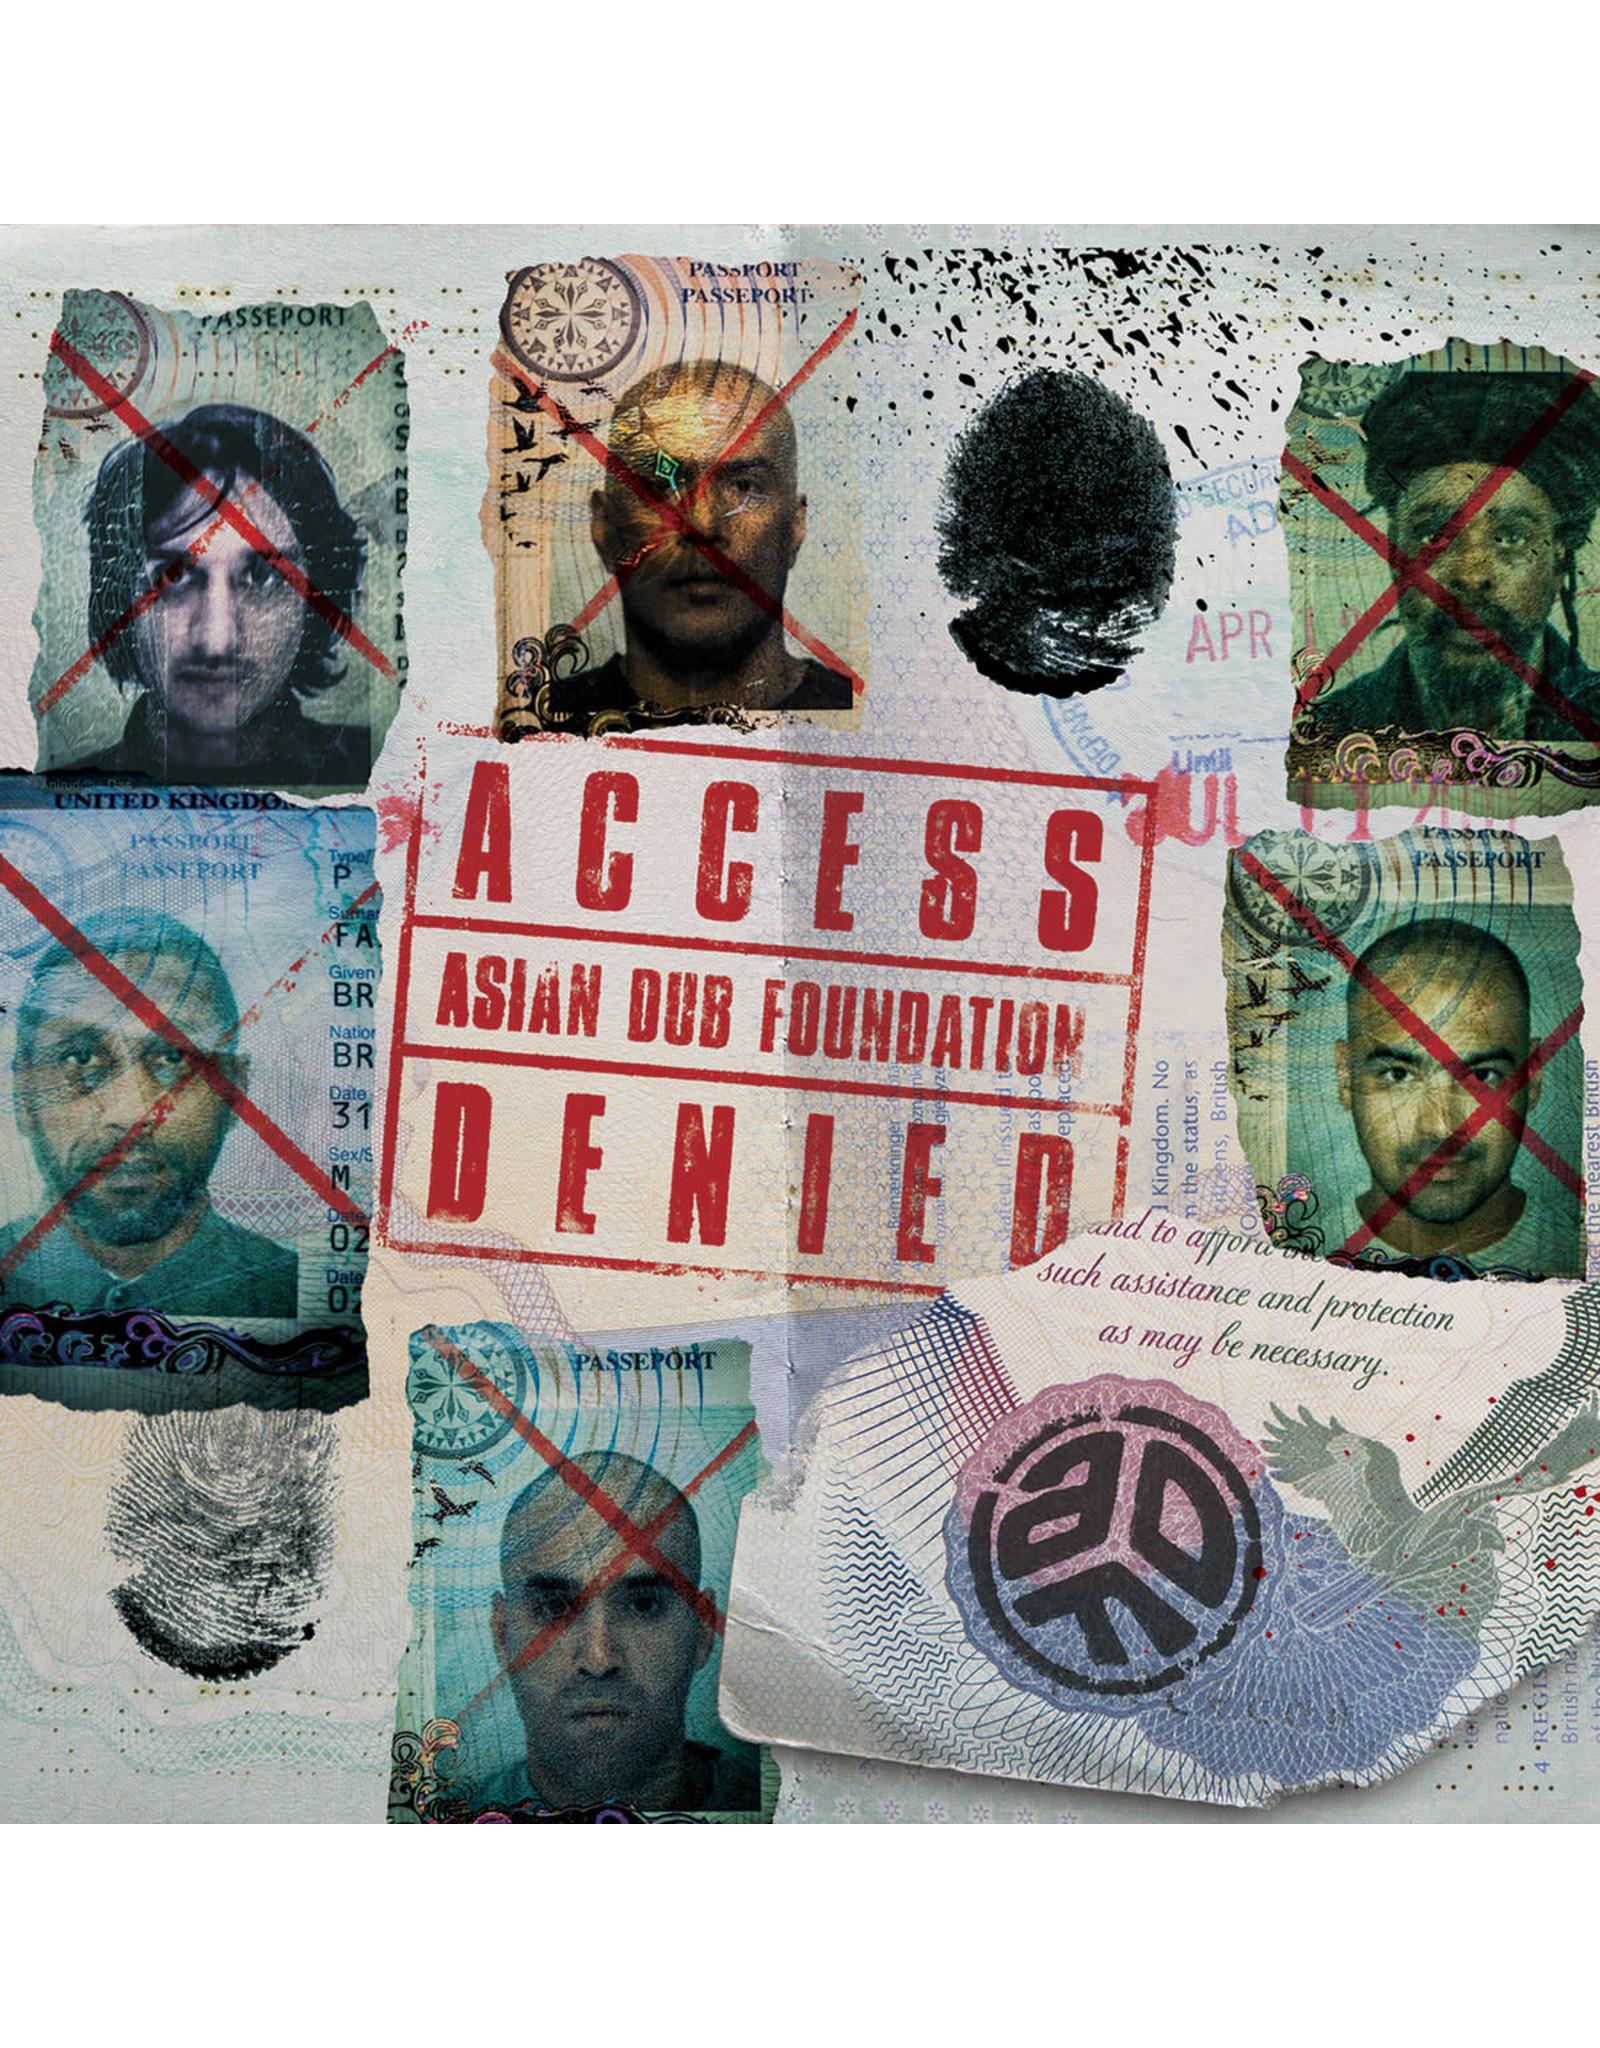 New Vinyl Asian Dub Foundation - Access Denied 2LP